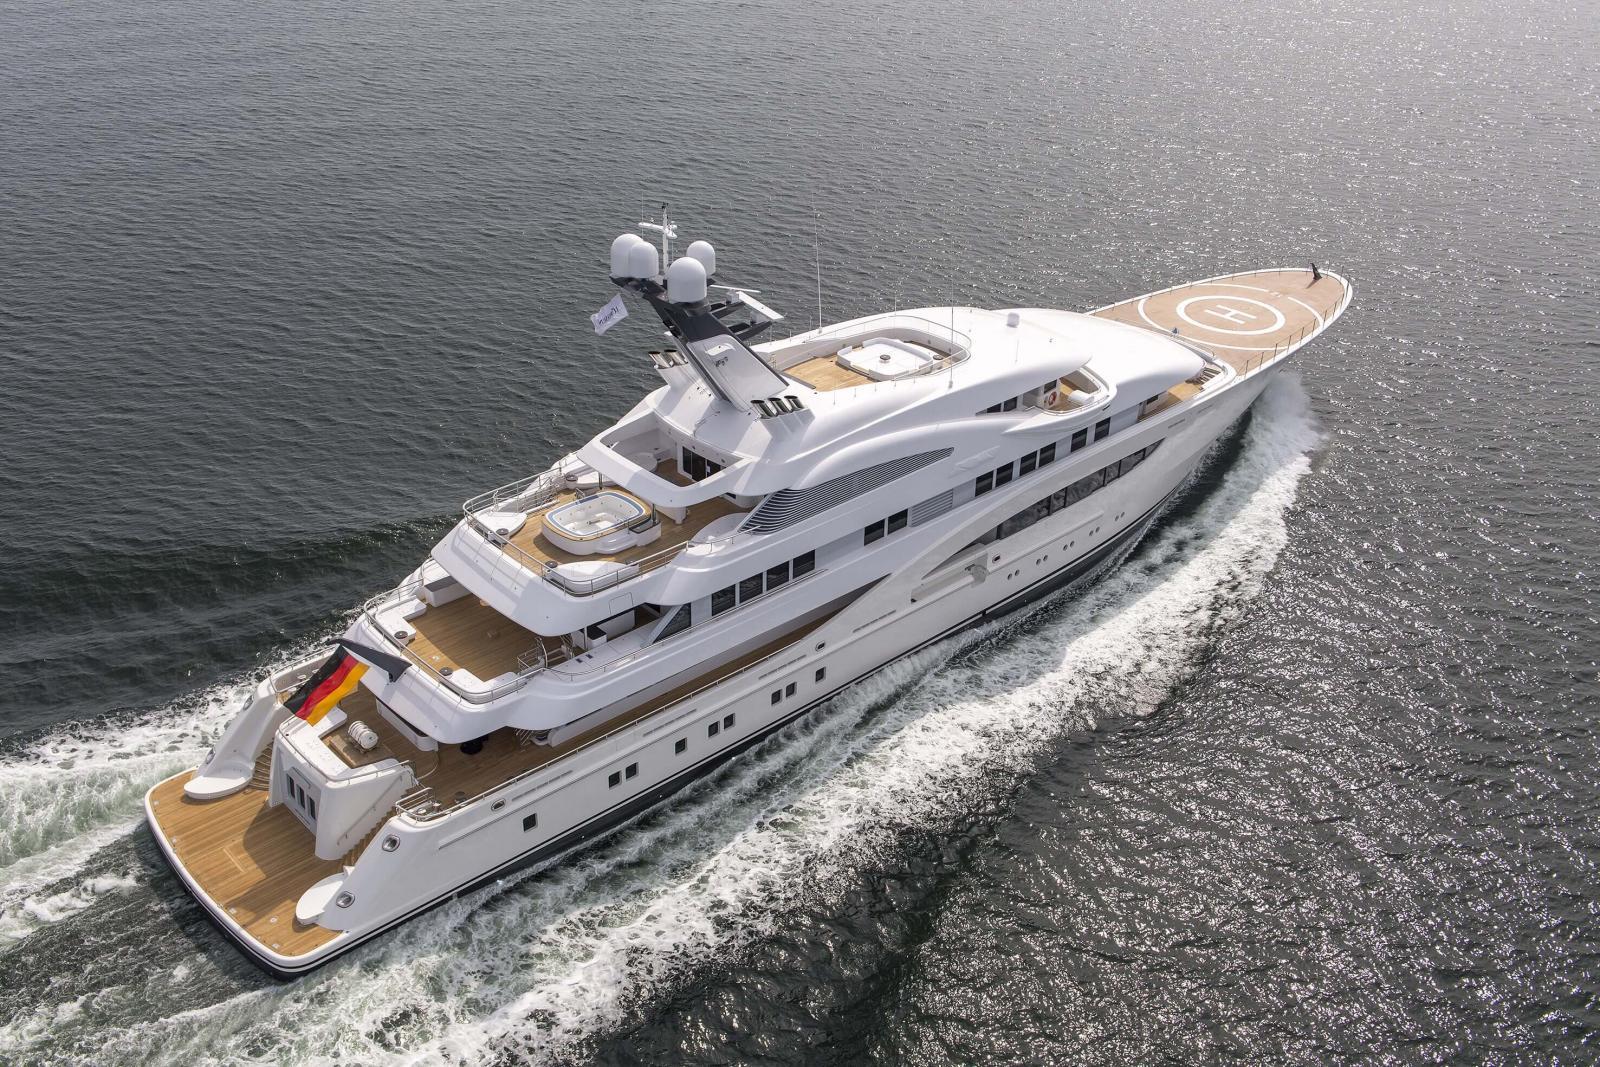 Lürssen 85m superyacht Areti